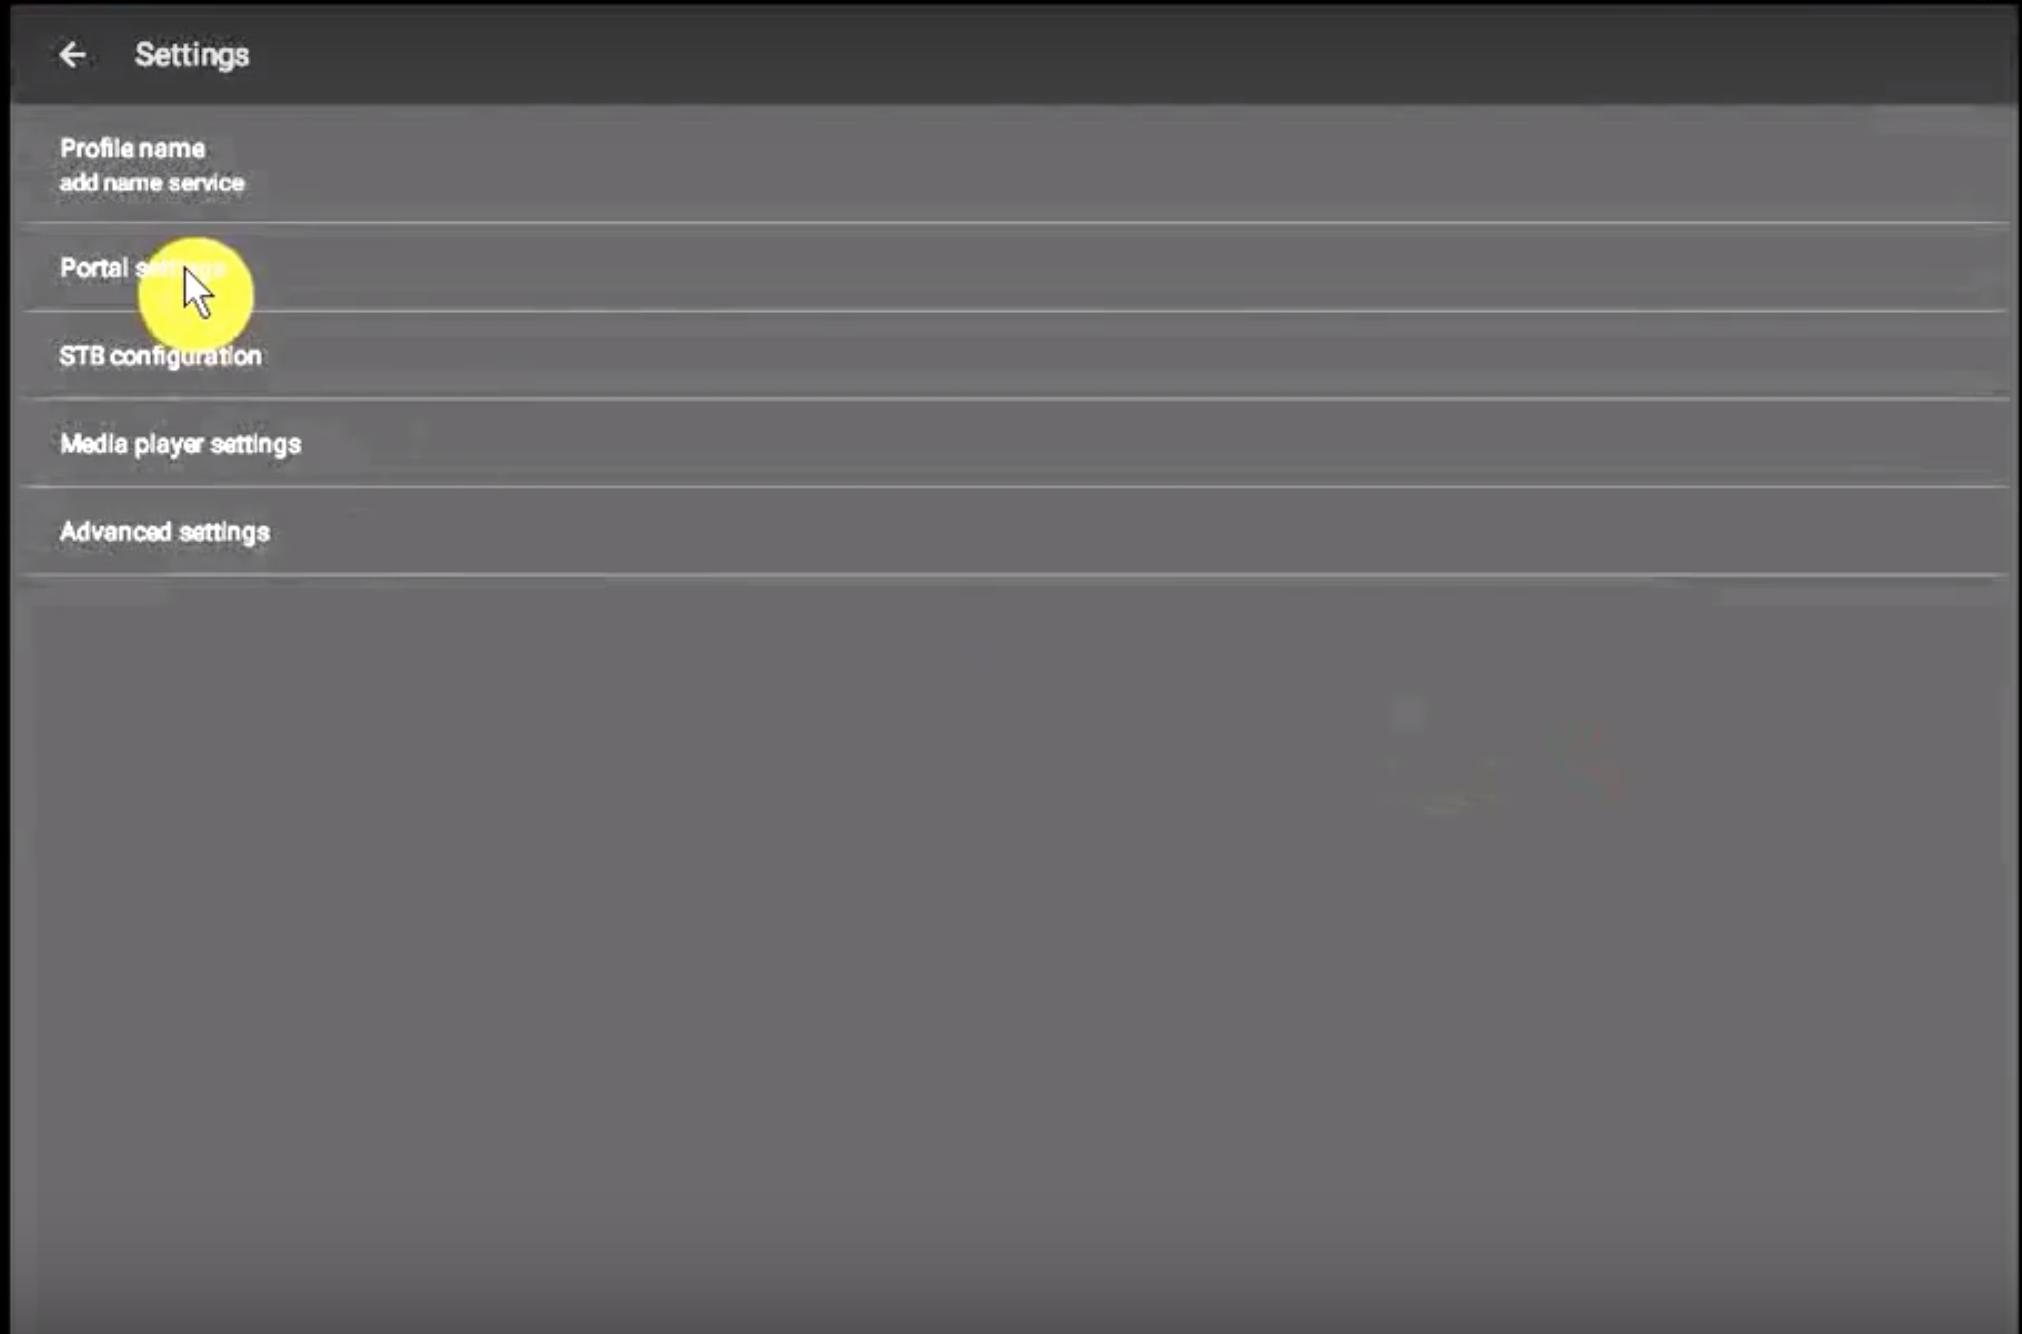 Free Stb Emulator Portal